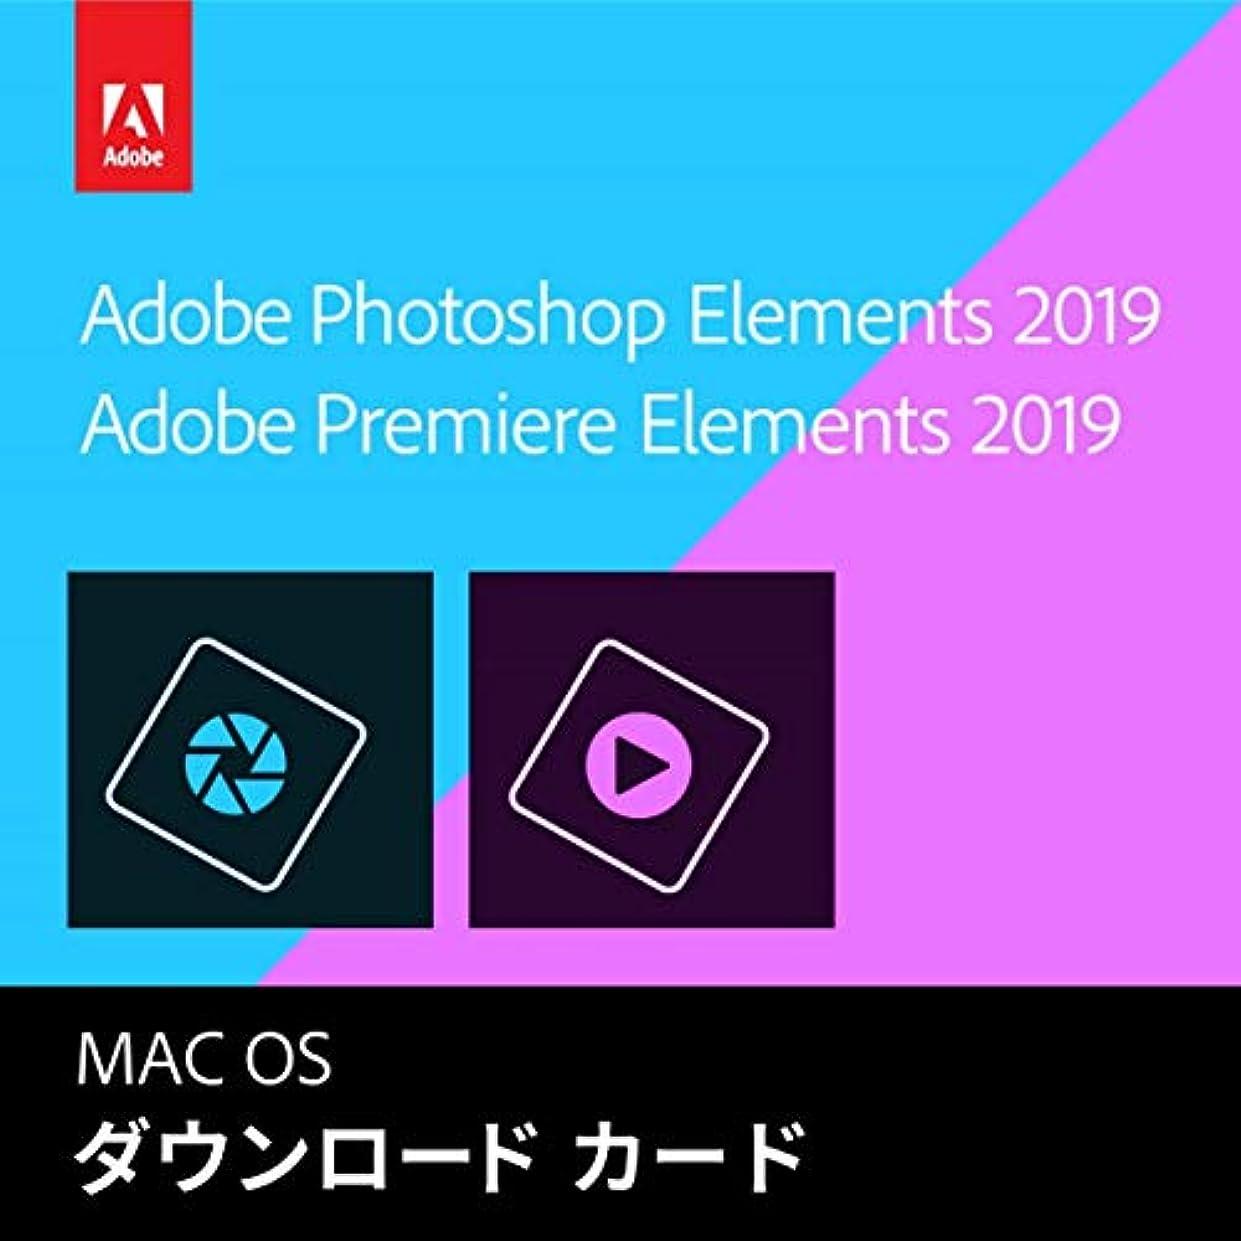 Adobe Photoshop Elements 2019 & Adobe Premiere Elements 2019|Mac対応|カード版(Amazon.co.jp限定)